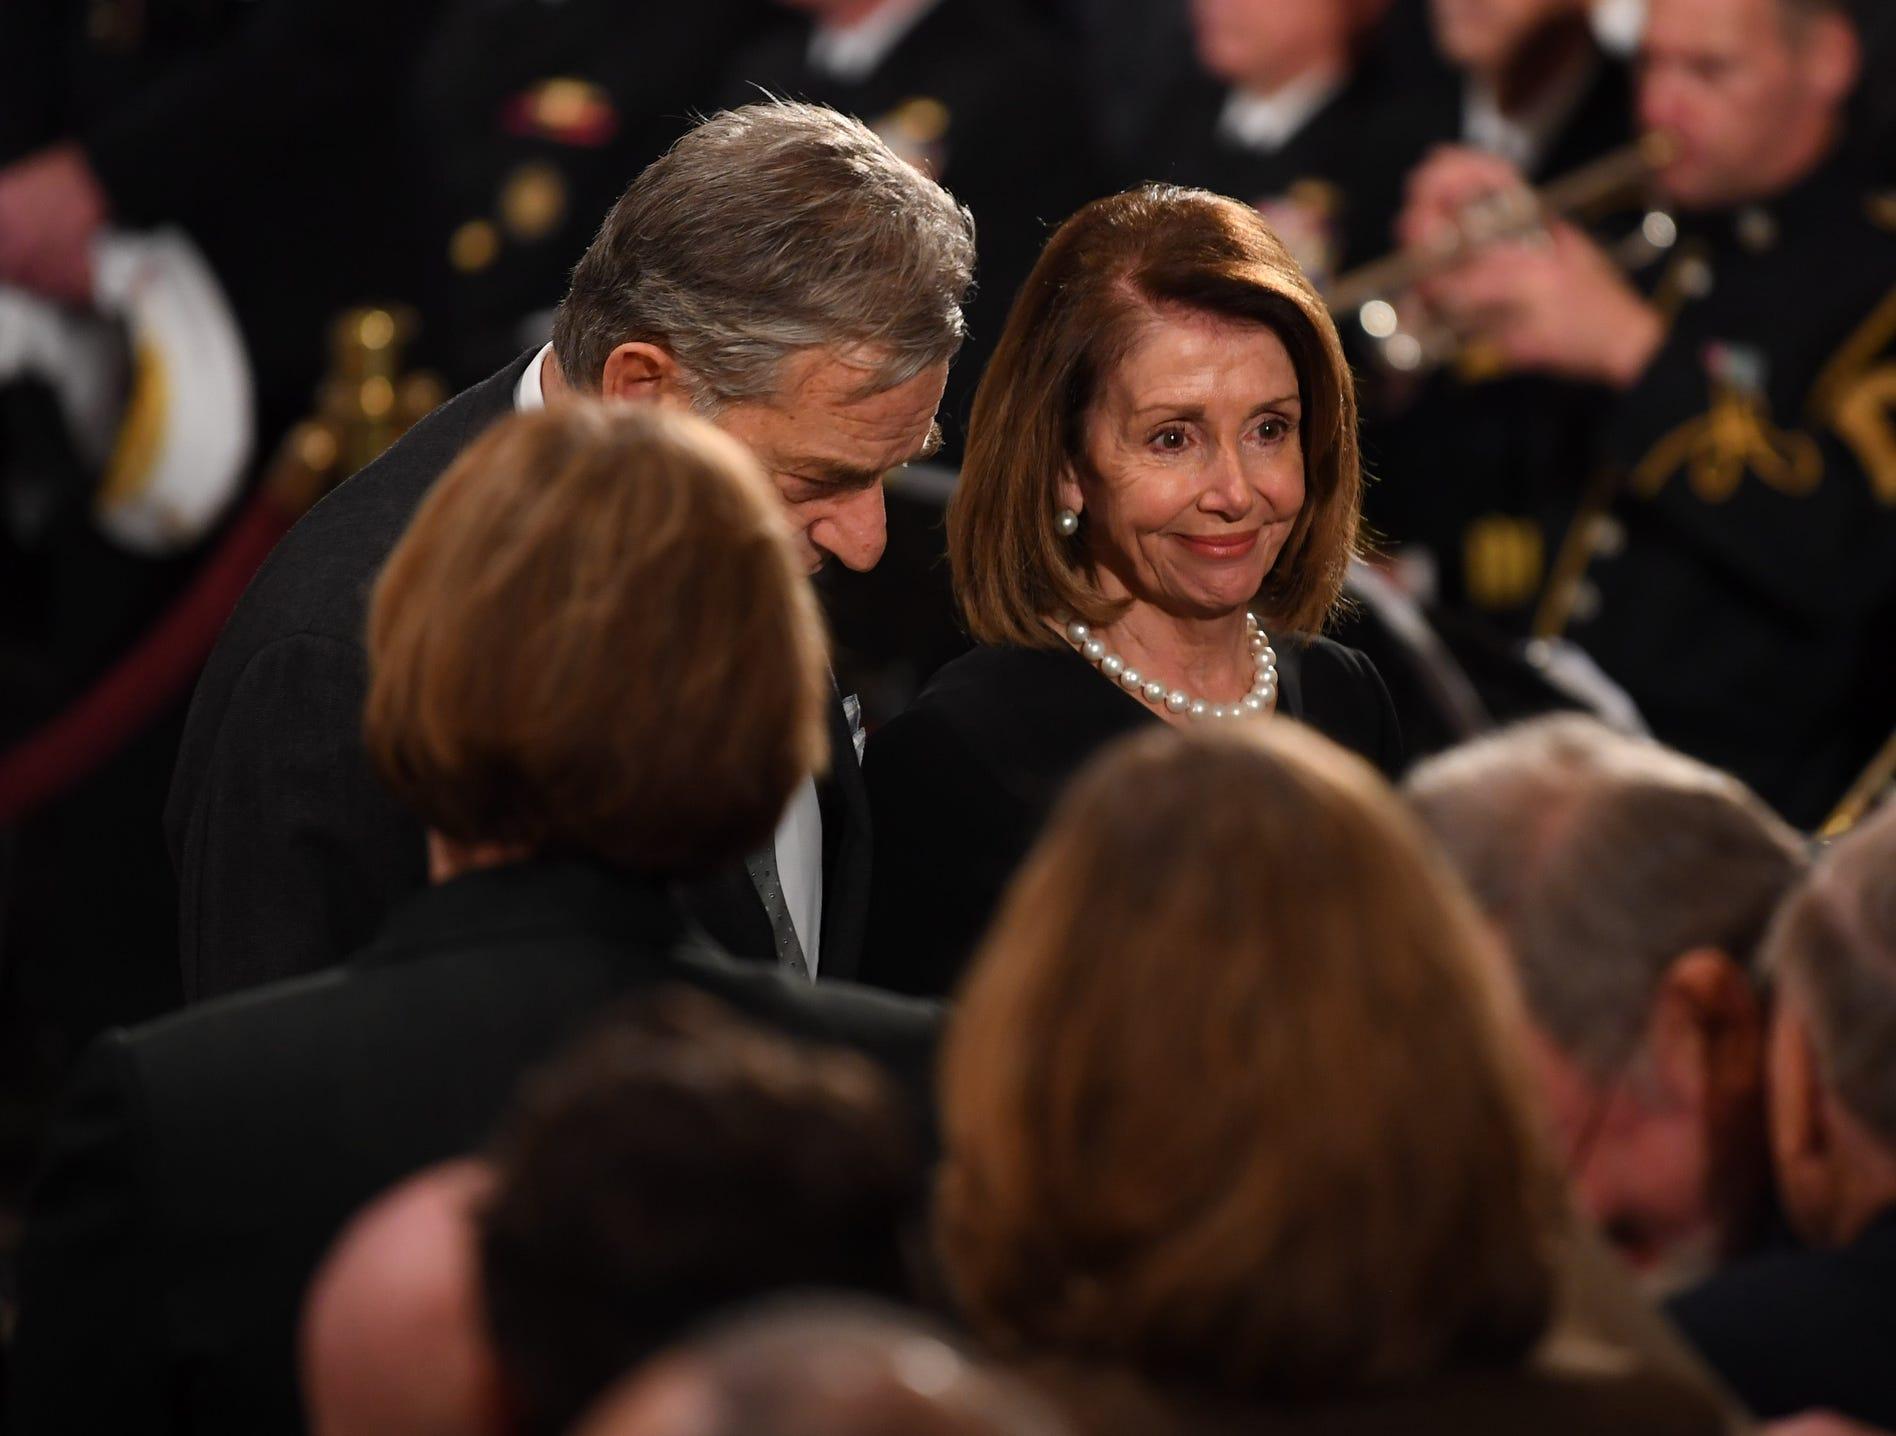 U.S. House Minority Leader Rep. Nancy Pelosi (D-CA)  smiles at the Capitol Rotunda service for the President George H.W. Bush.